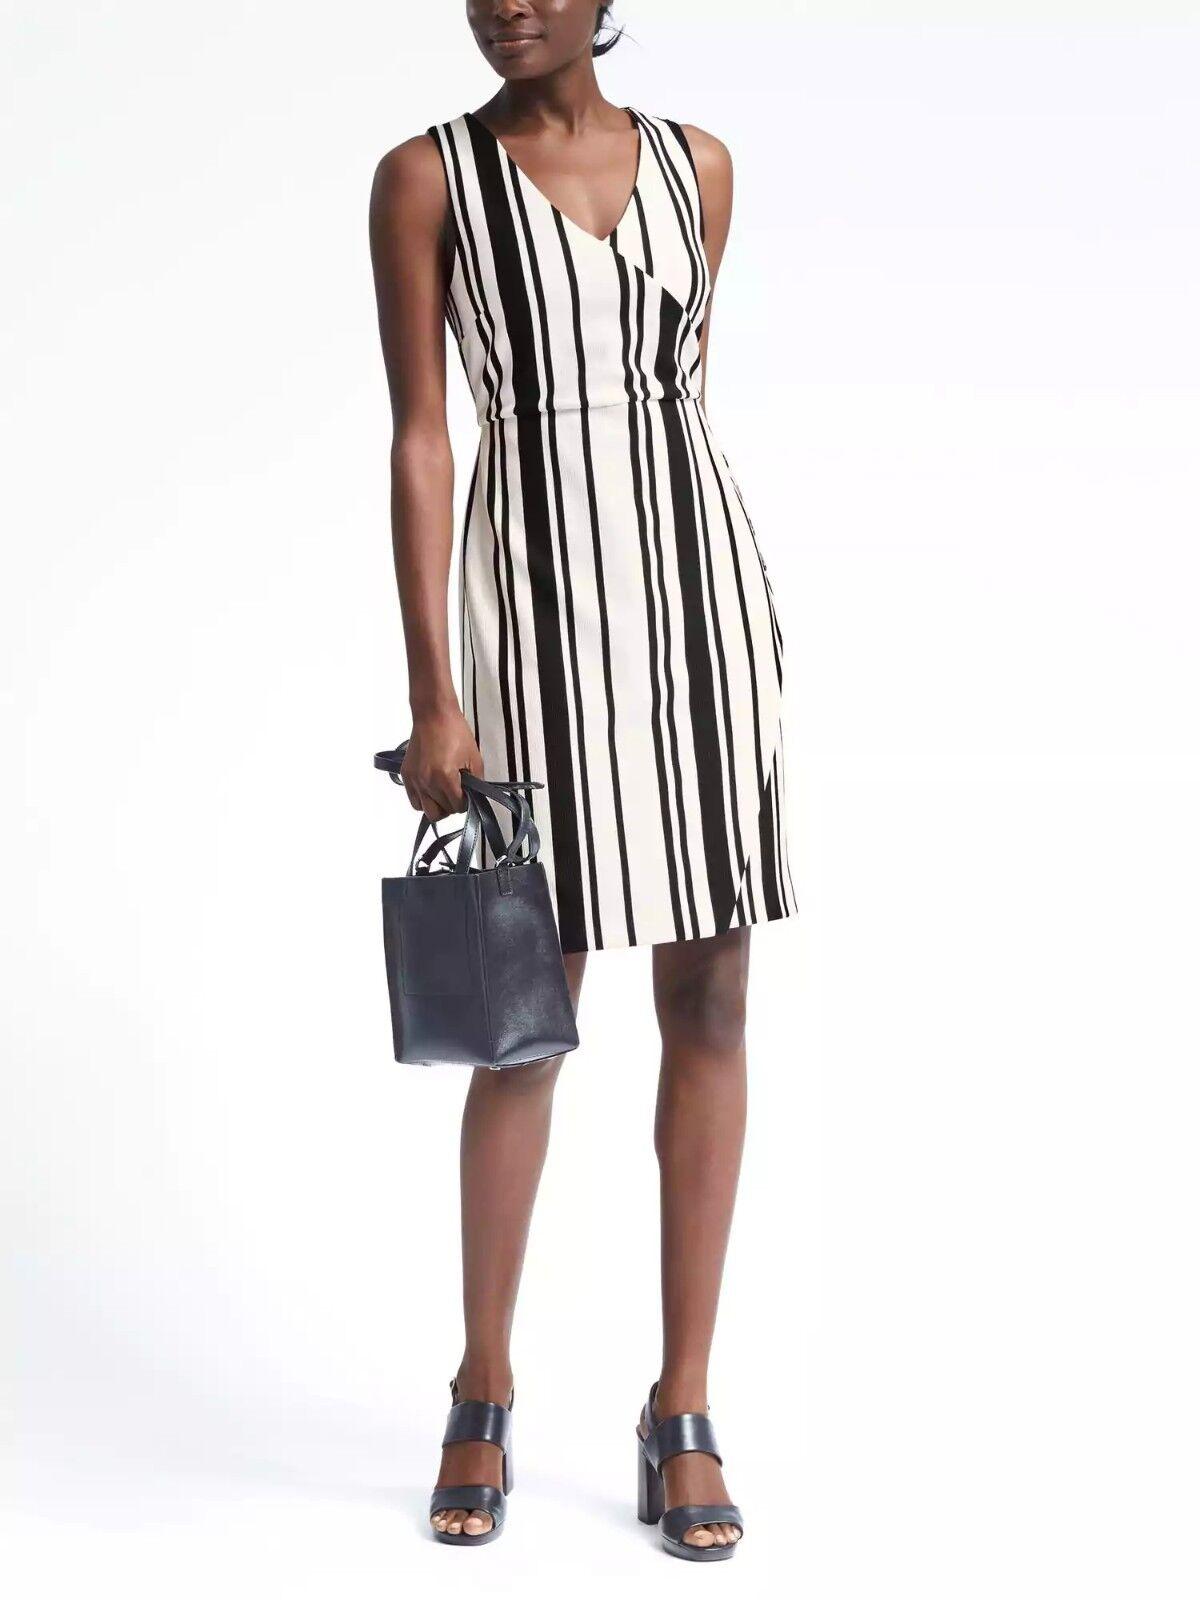 Banana Republic Stripe Knit Wrap-Effect Dress,Navy Stripe Größe 10T 10 T